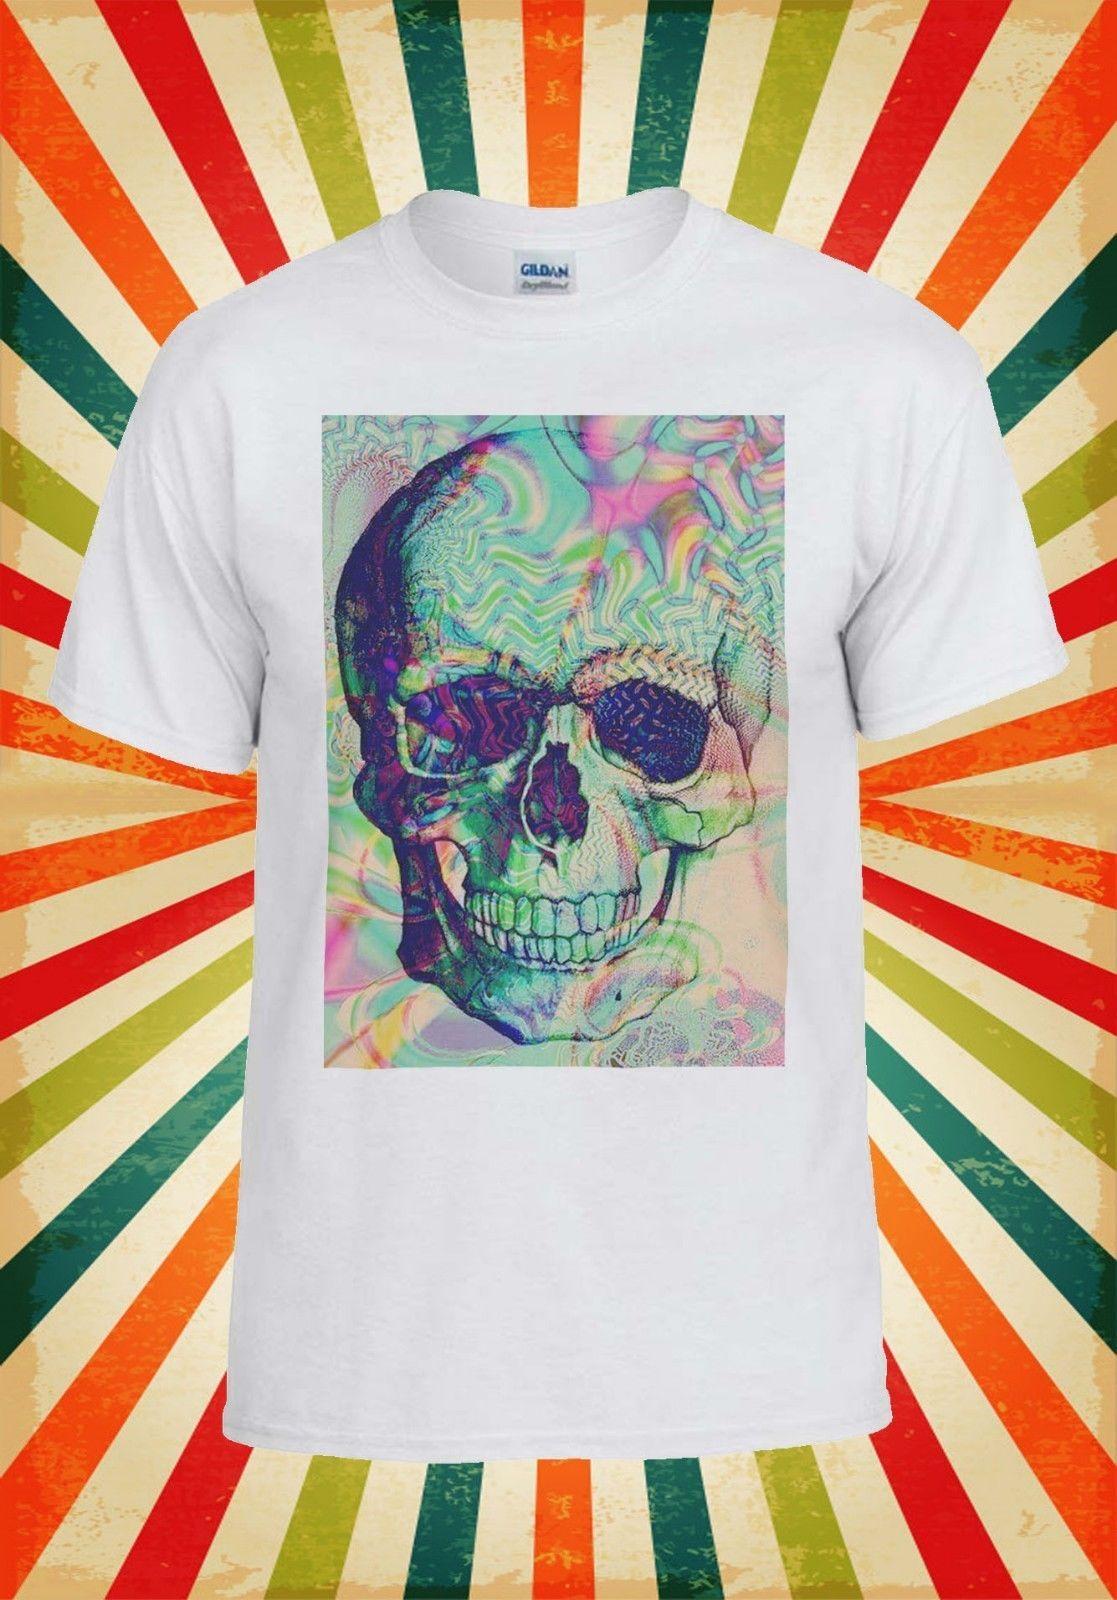 7728c199 Floral Skull Tattoo Art Funny Cool Unisex T Shirt 911 Cattt Windbreaker Pug  Tshirt Trump Sweat Sporter T Shirt Fan Pants T Shirt Crazy Design Shirts  Best ...